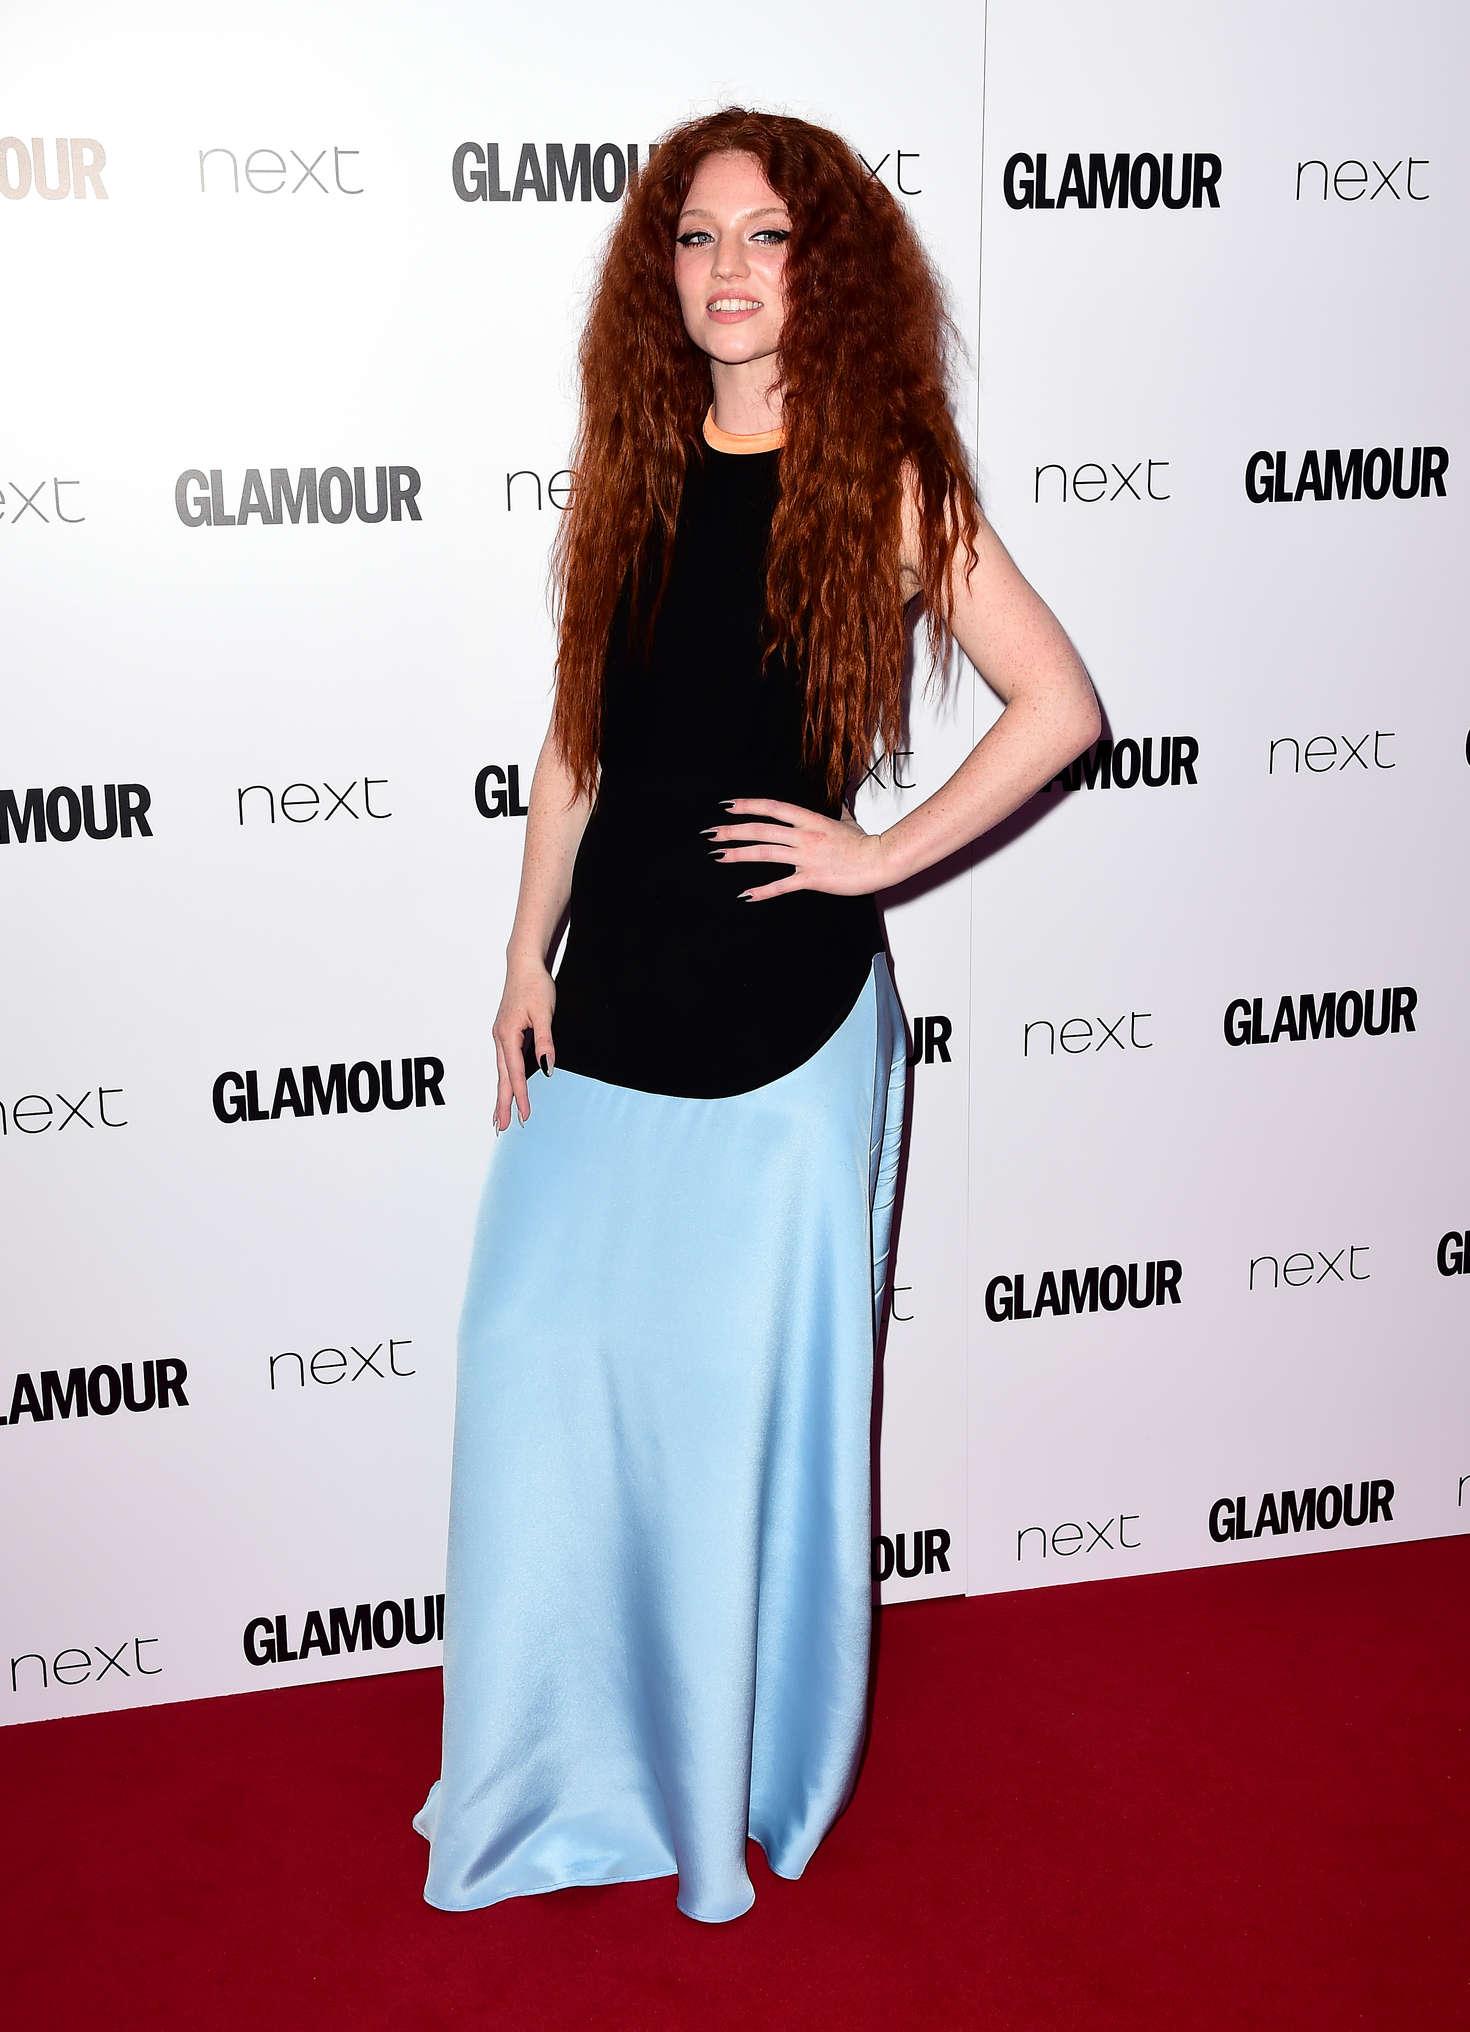 Jess Glynne - Glamour Women of the Year Awards 2016 in London